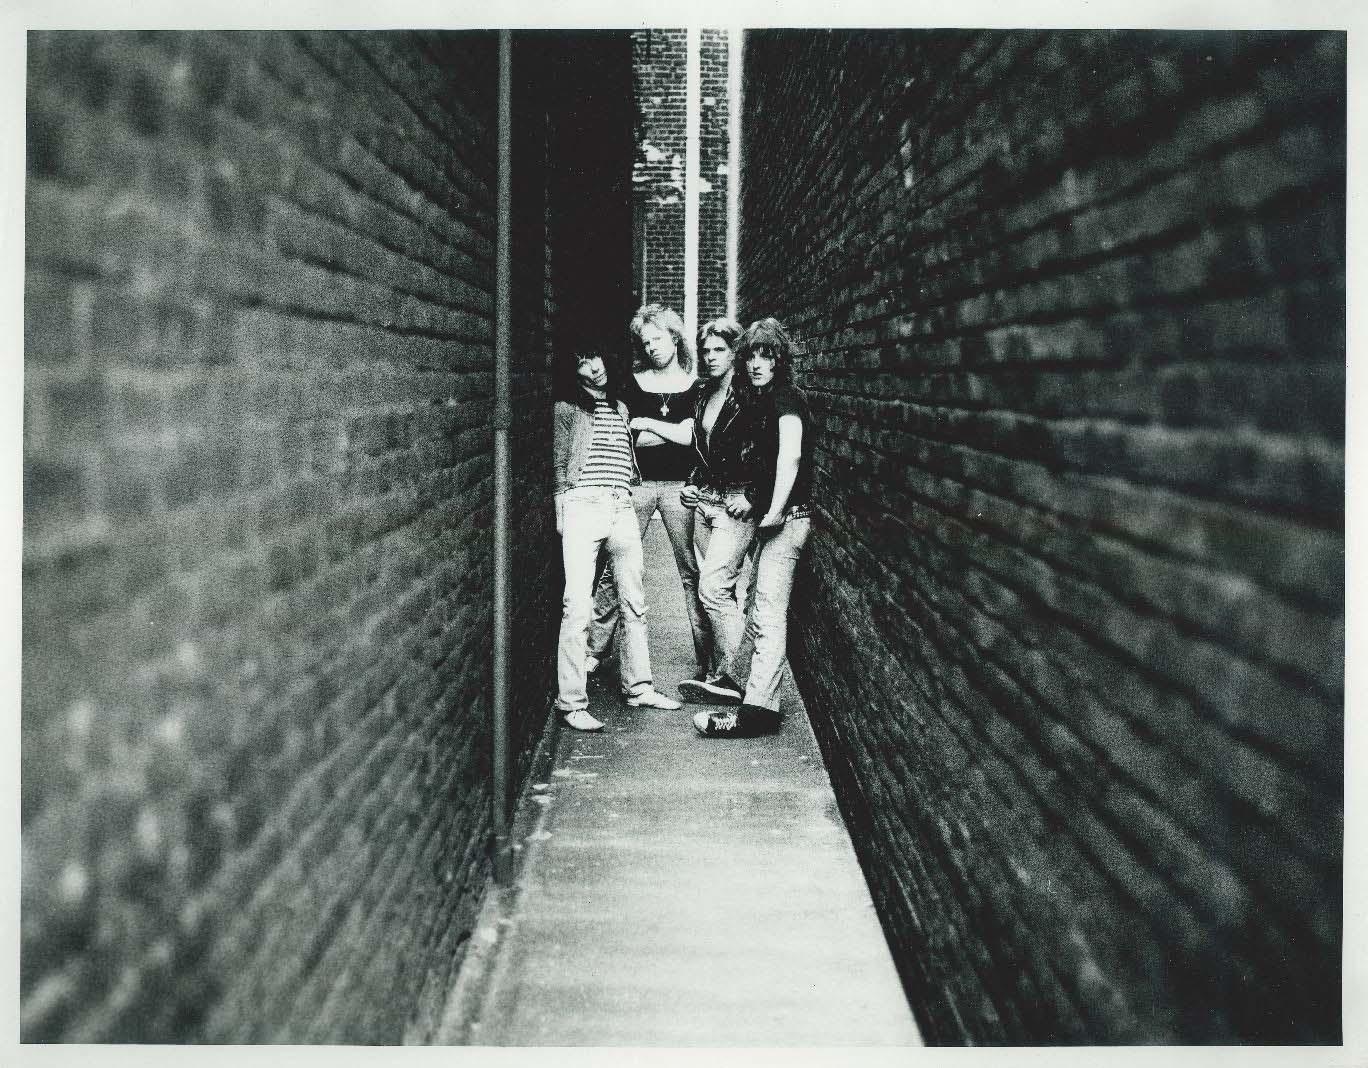 Dead Boys photo by Dave Treat